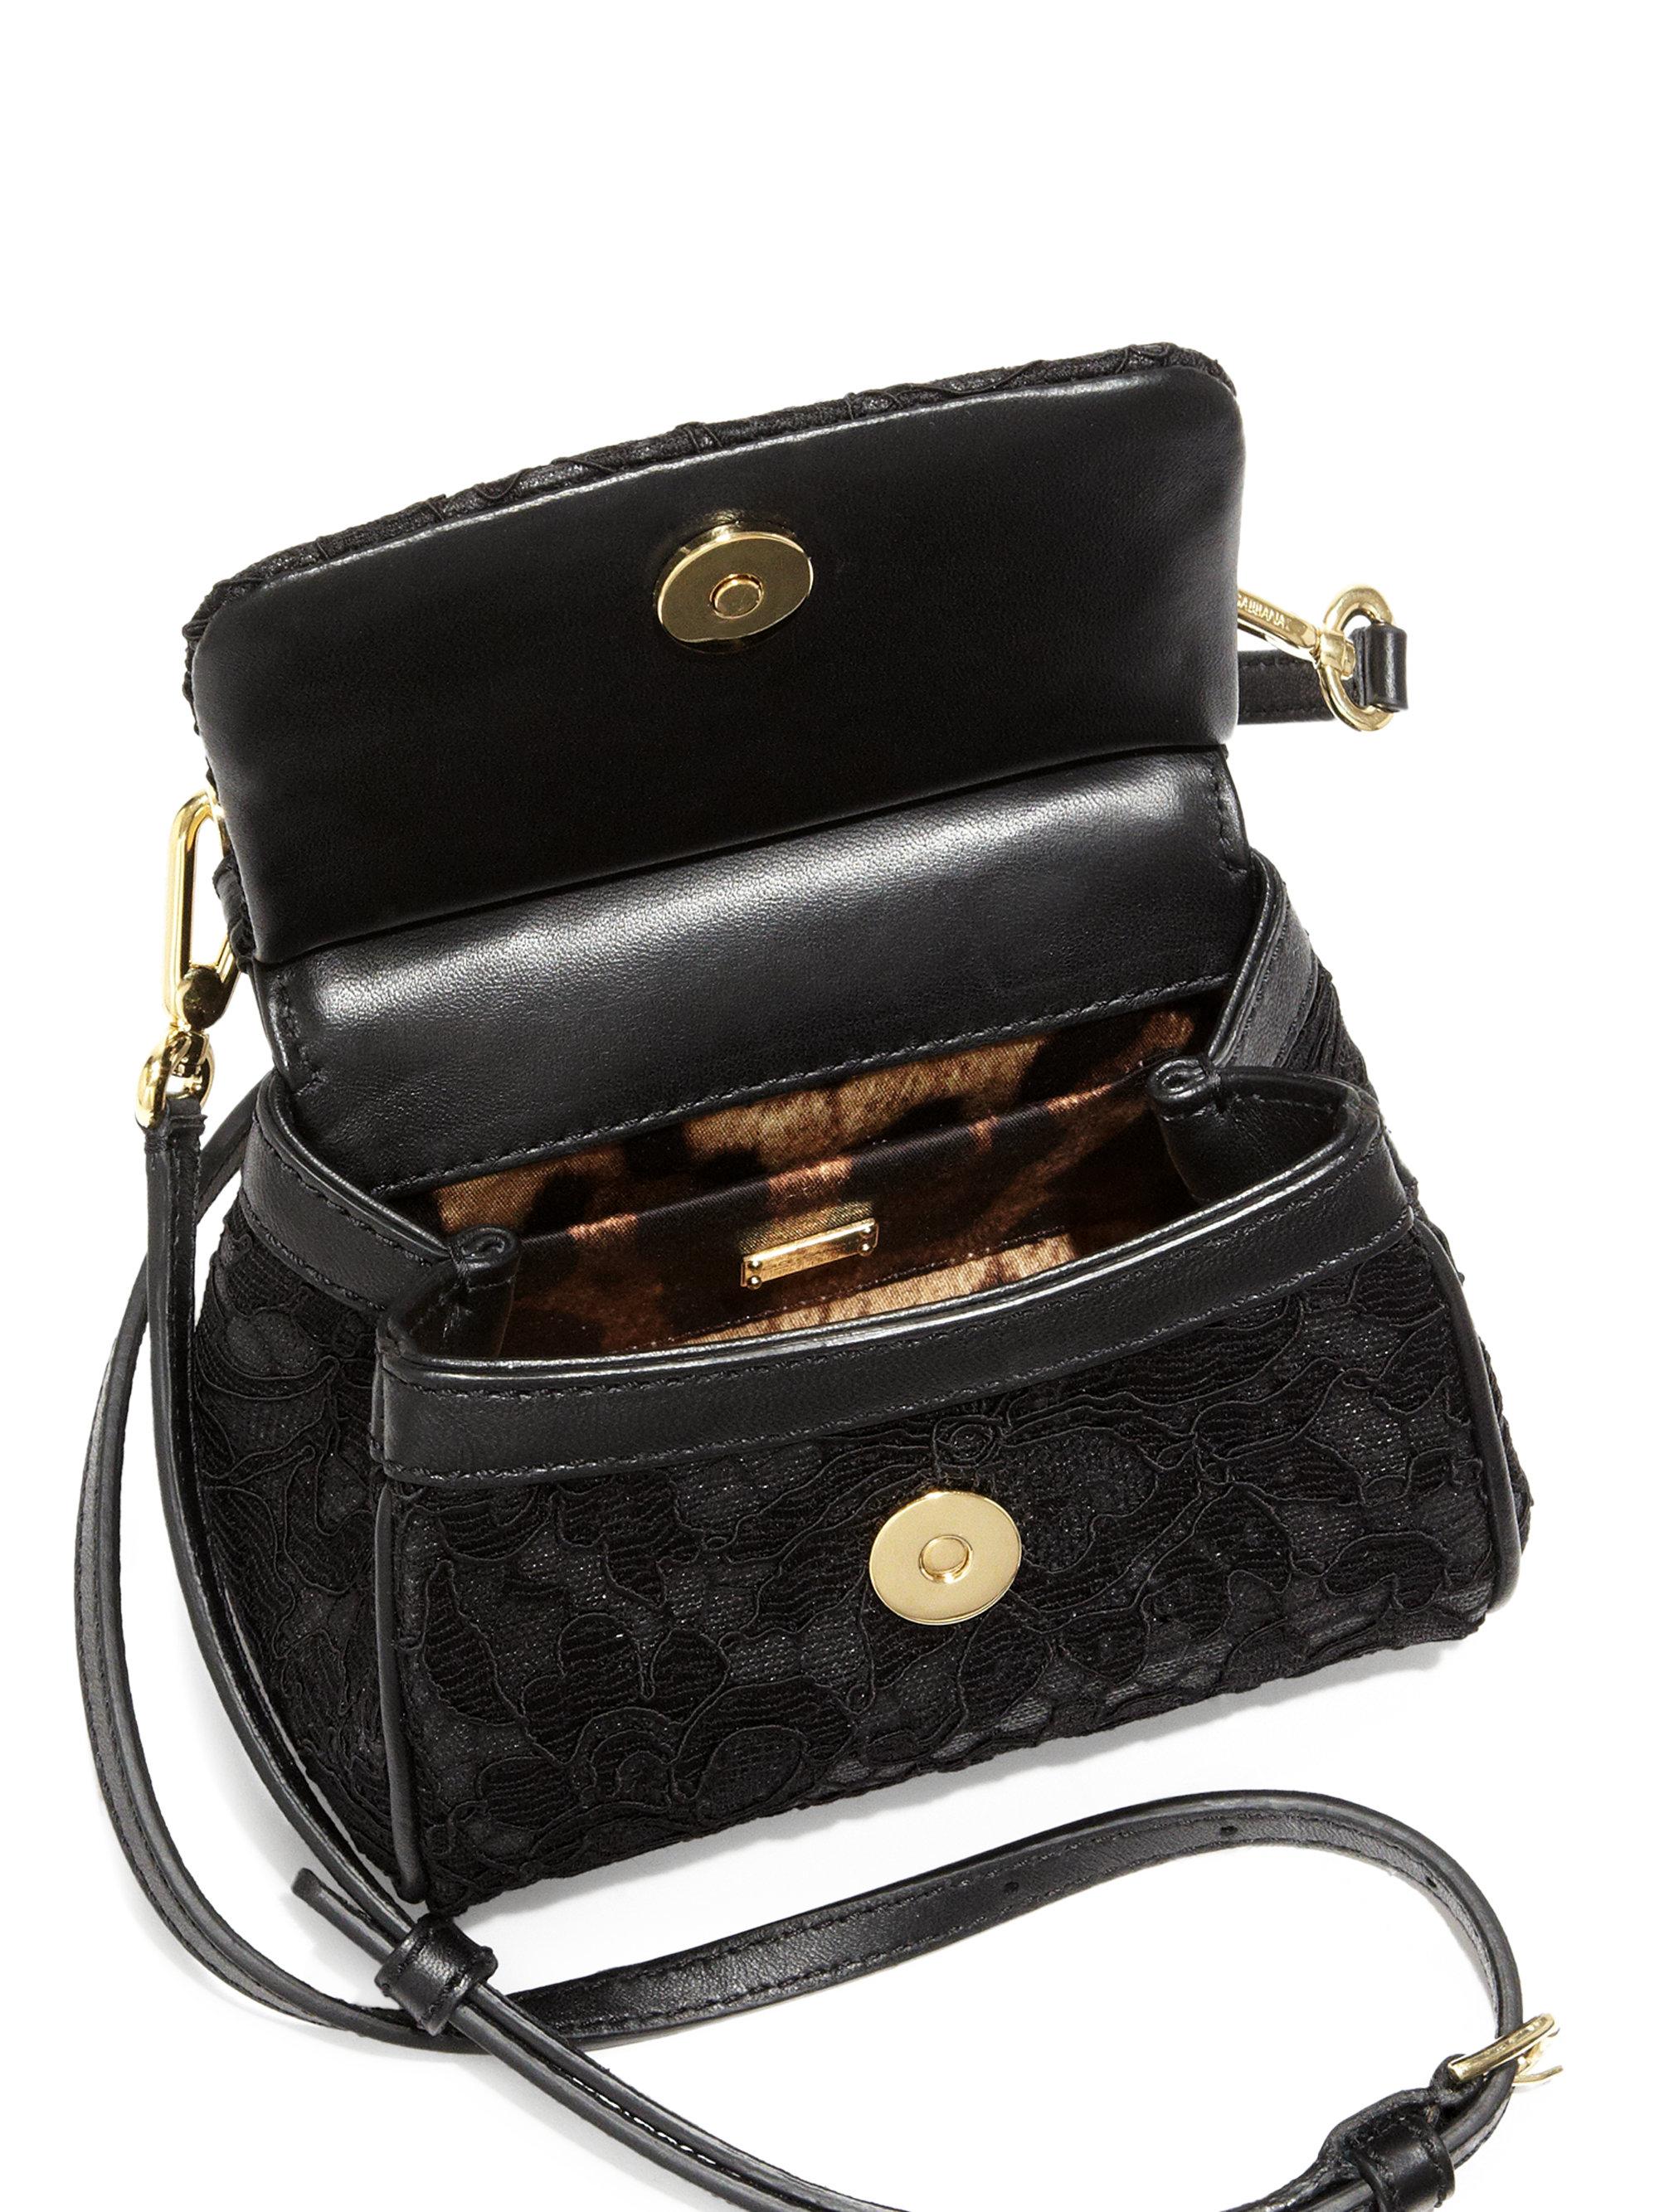 Lyst - Dolce   Gabbana Miss Sicily Lace Mini Crossbody Bag in Black a6bec11740